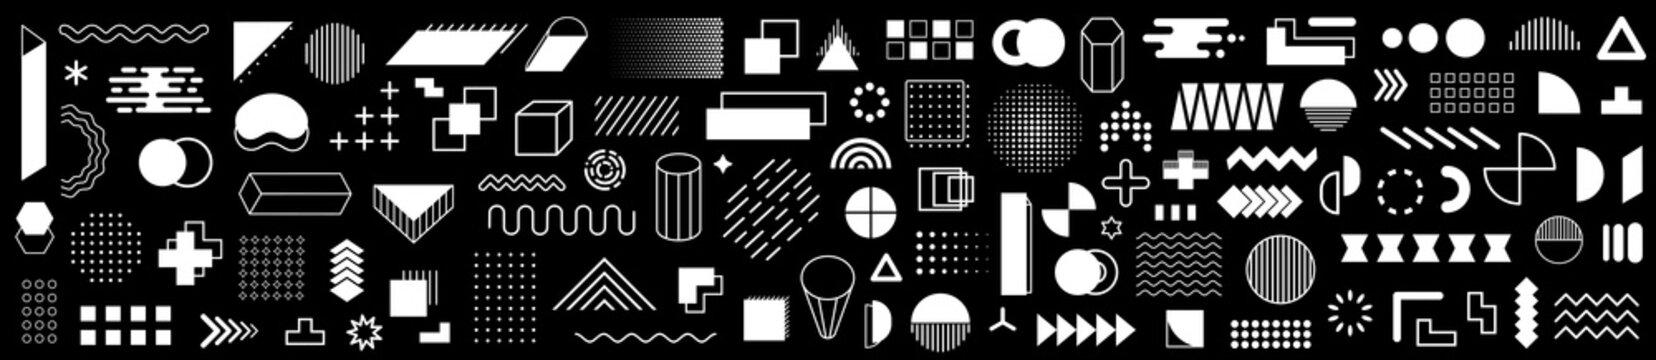 Set of 115 geometric shapes icons. Memphis design retro elements. Collection trendy halftone geometric shapes. Retro funky graphic, 90s trends designs and vintage print element collection - vector